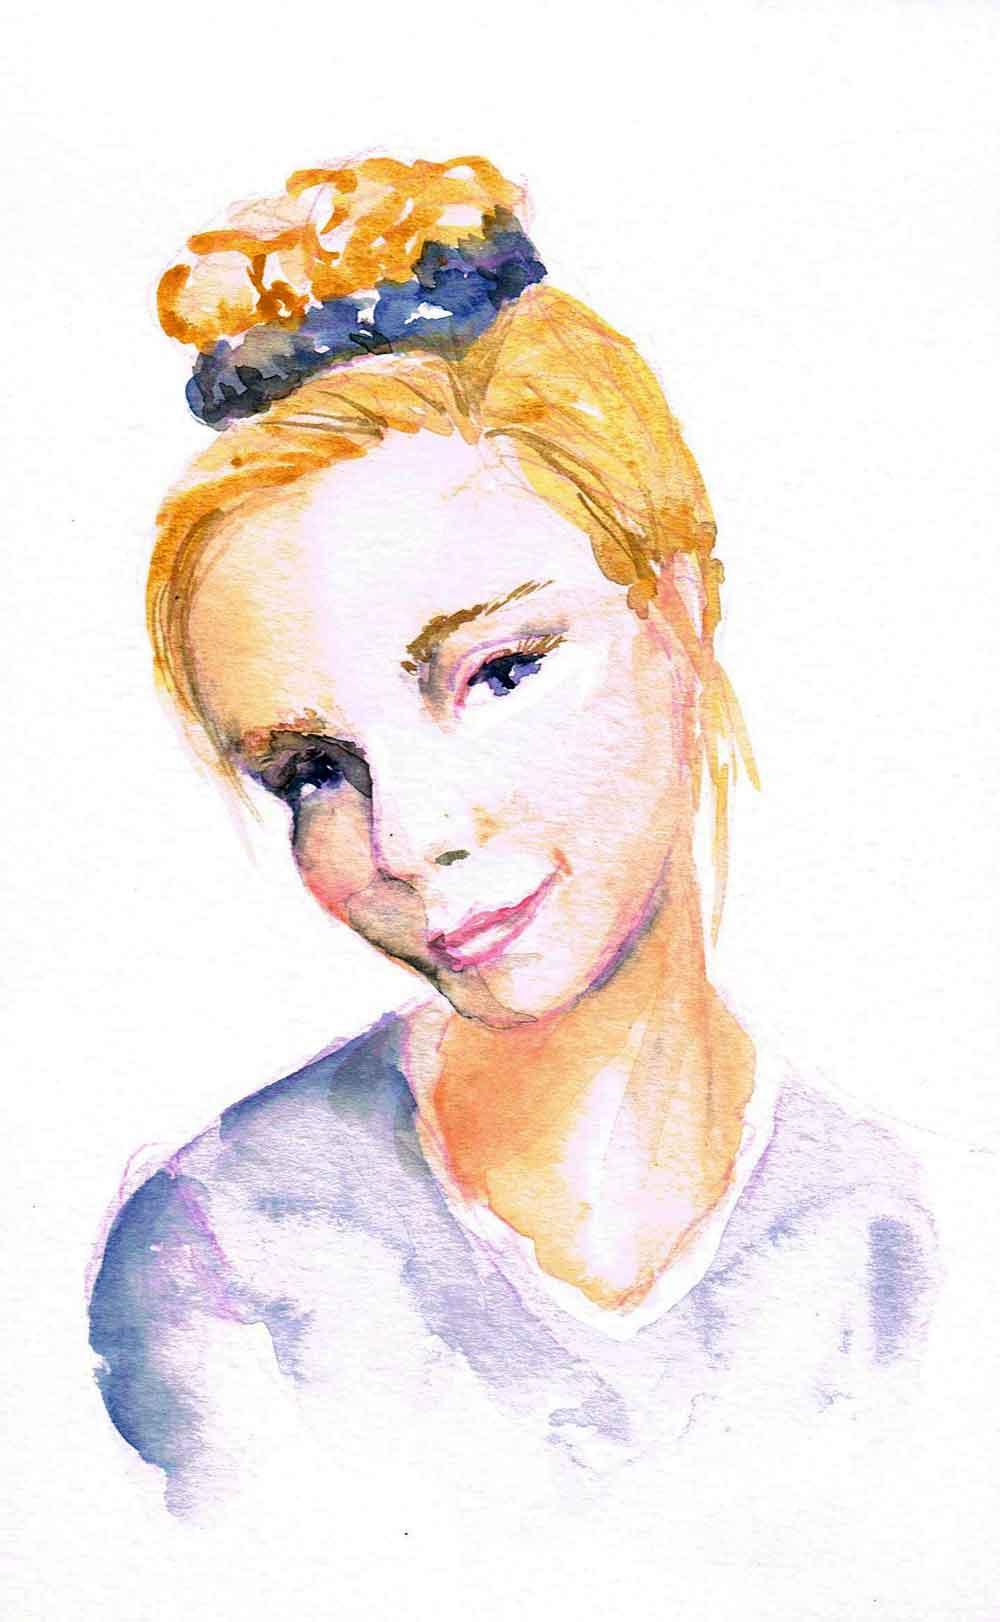 "Watercolour portraits no 7 - Shy (Watercolour sketchbook 5""x 8"")"